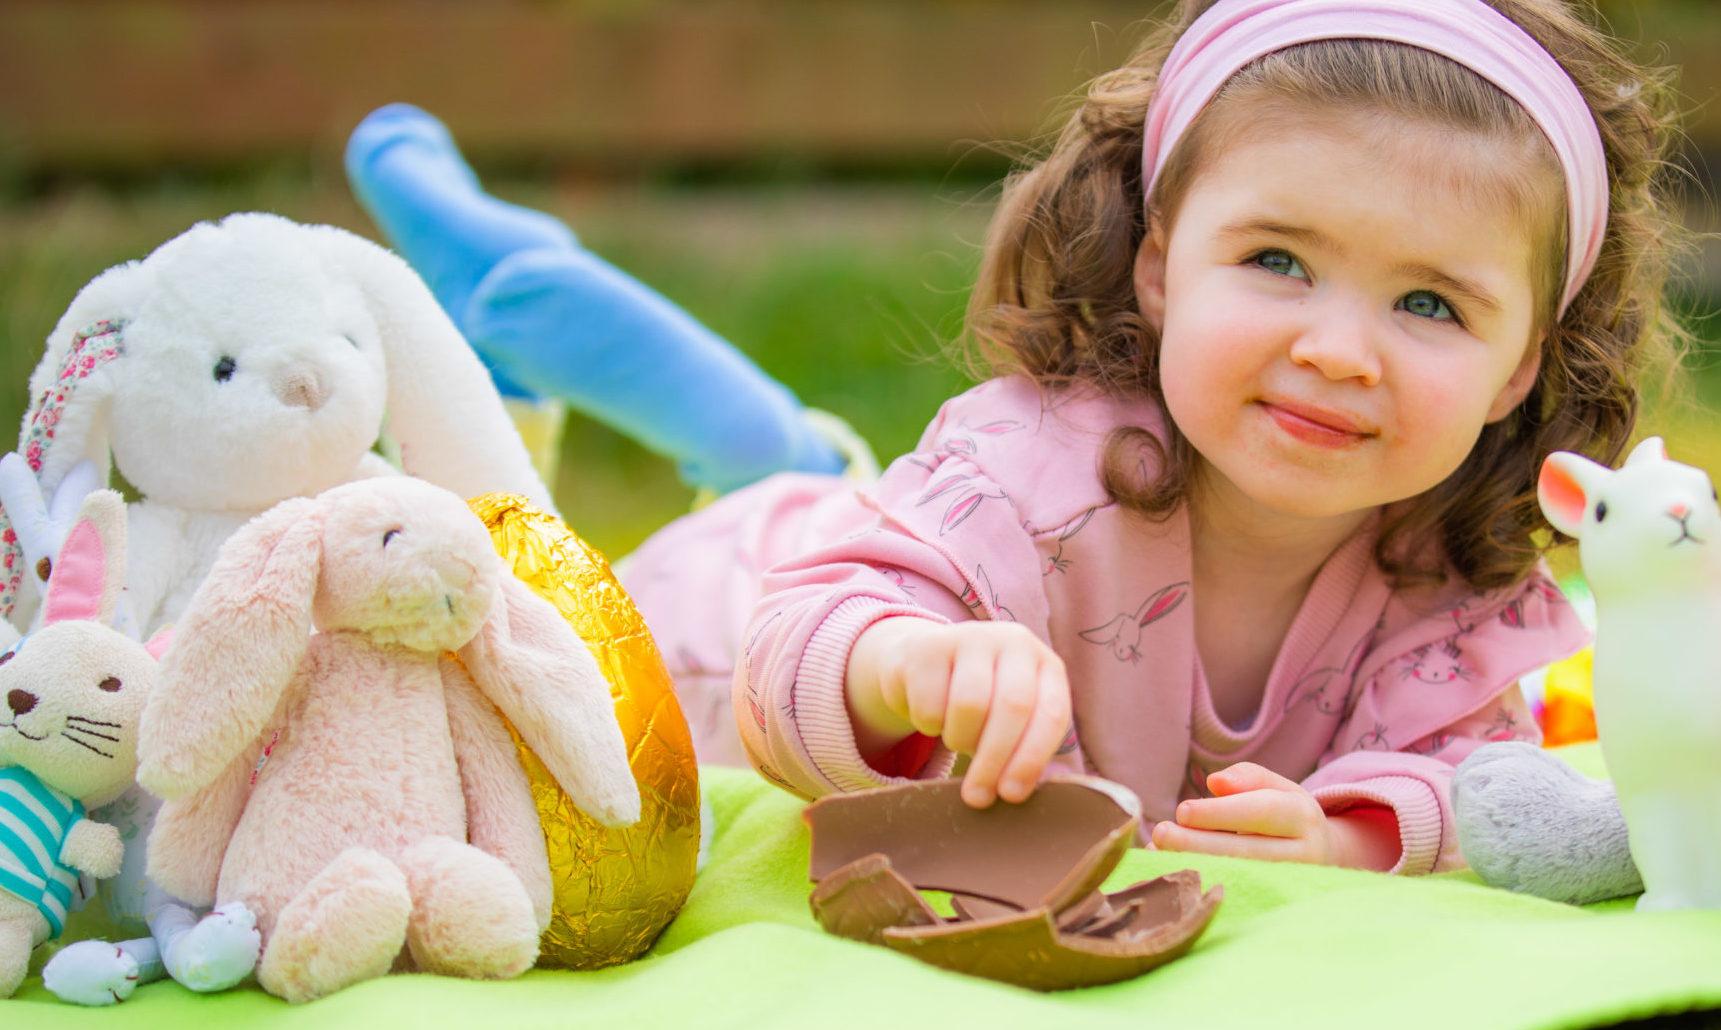 Clara MacDougall enjoying an afternoon of easter egg hunting.